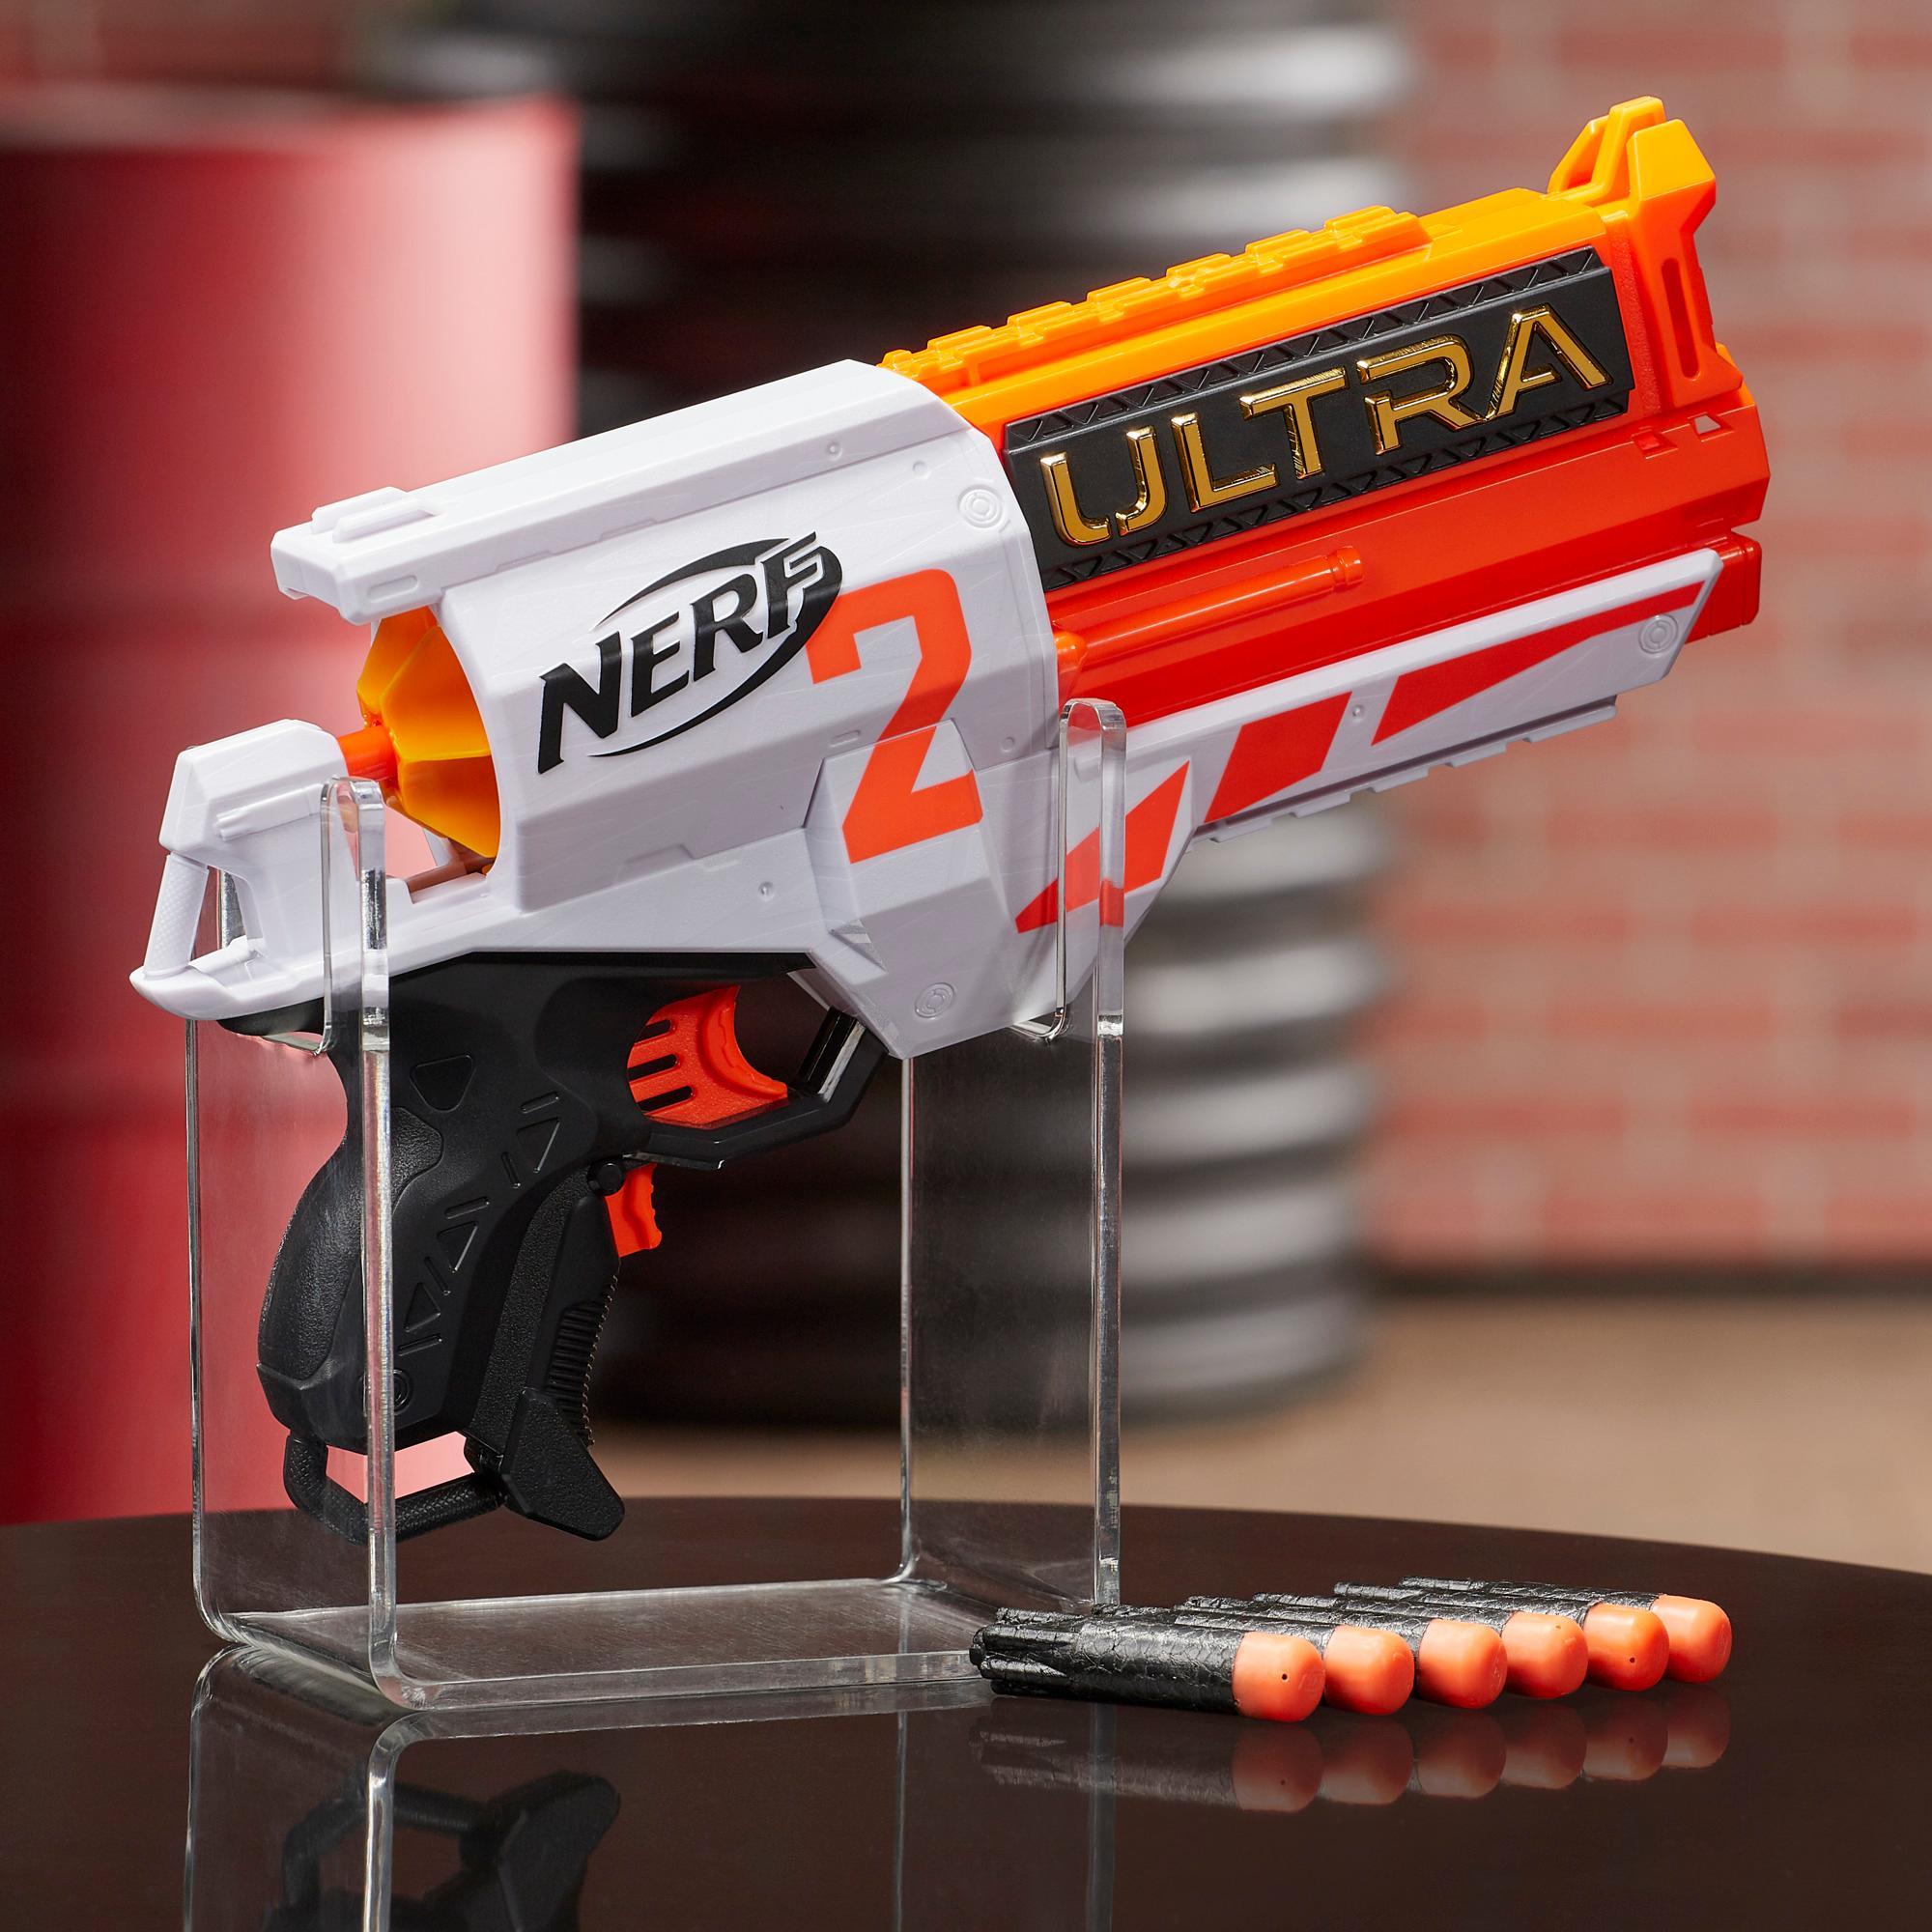 Lanzador motorizado Nerf Ultra Two -- Retrocarga rápida -- 6 dardos Nerf Ultra -- Solo compatible con dardos Nerf Ultra